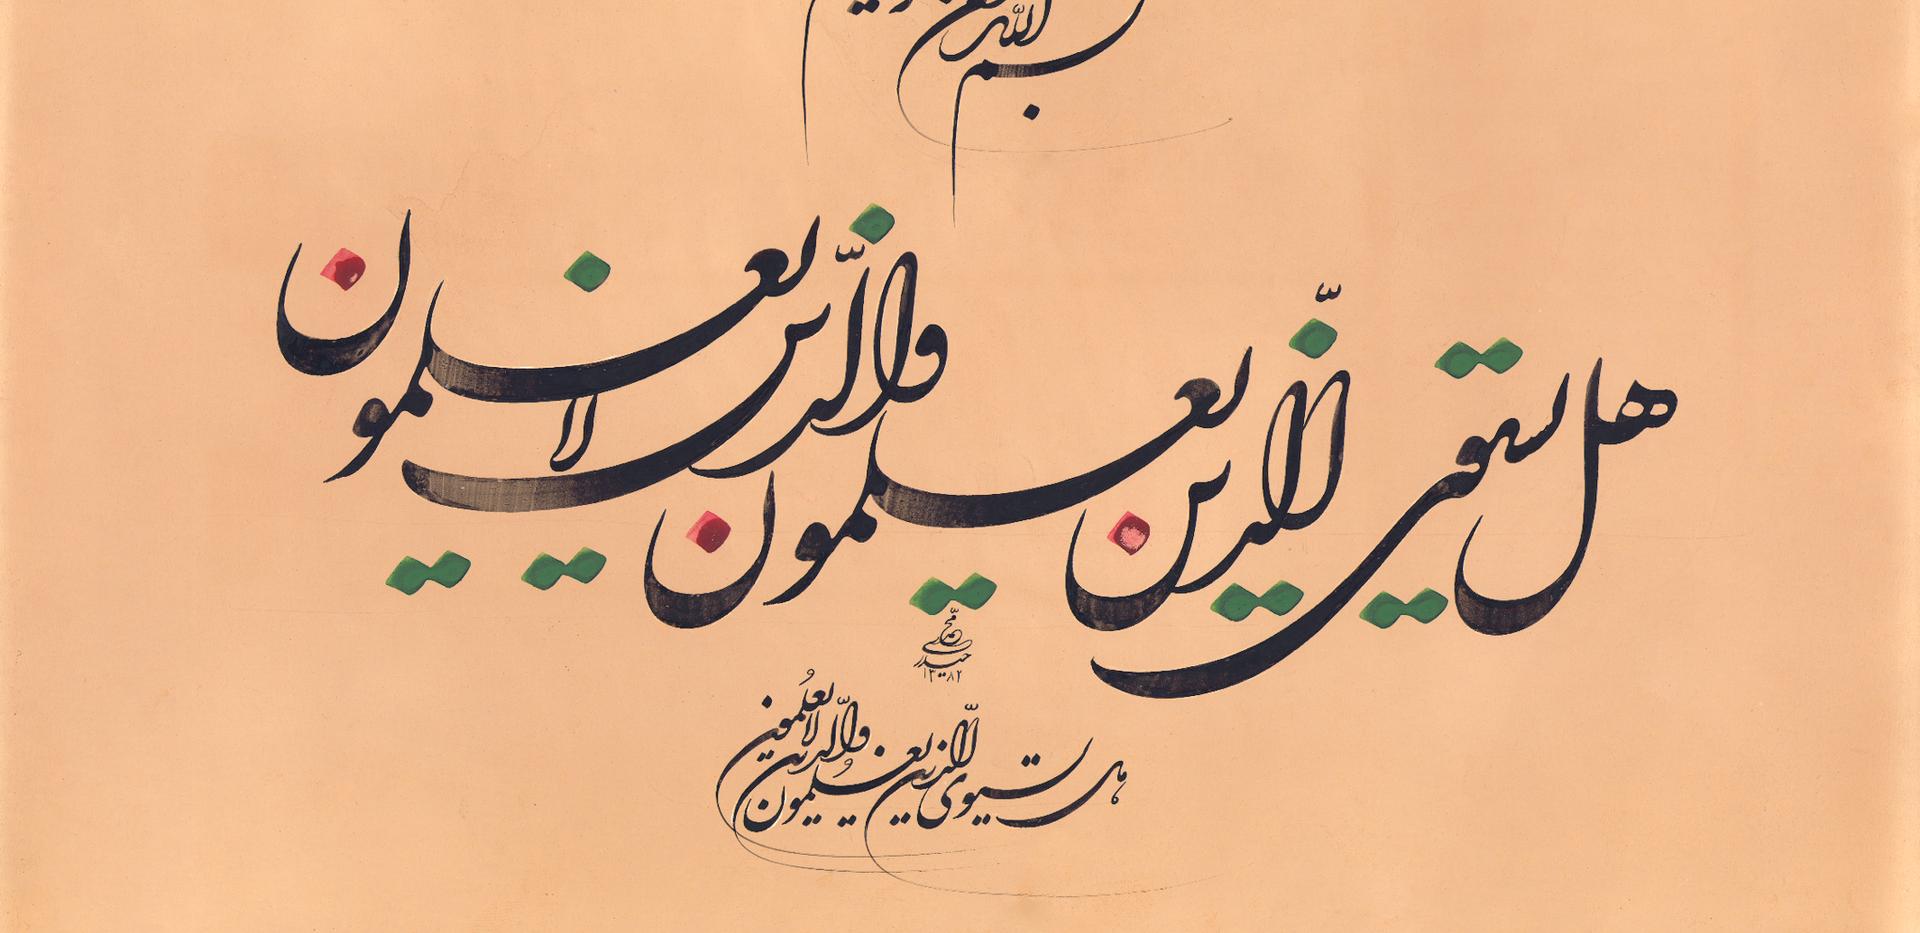 Mohamad Haydari